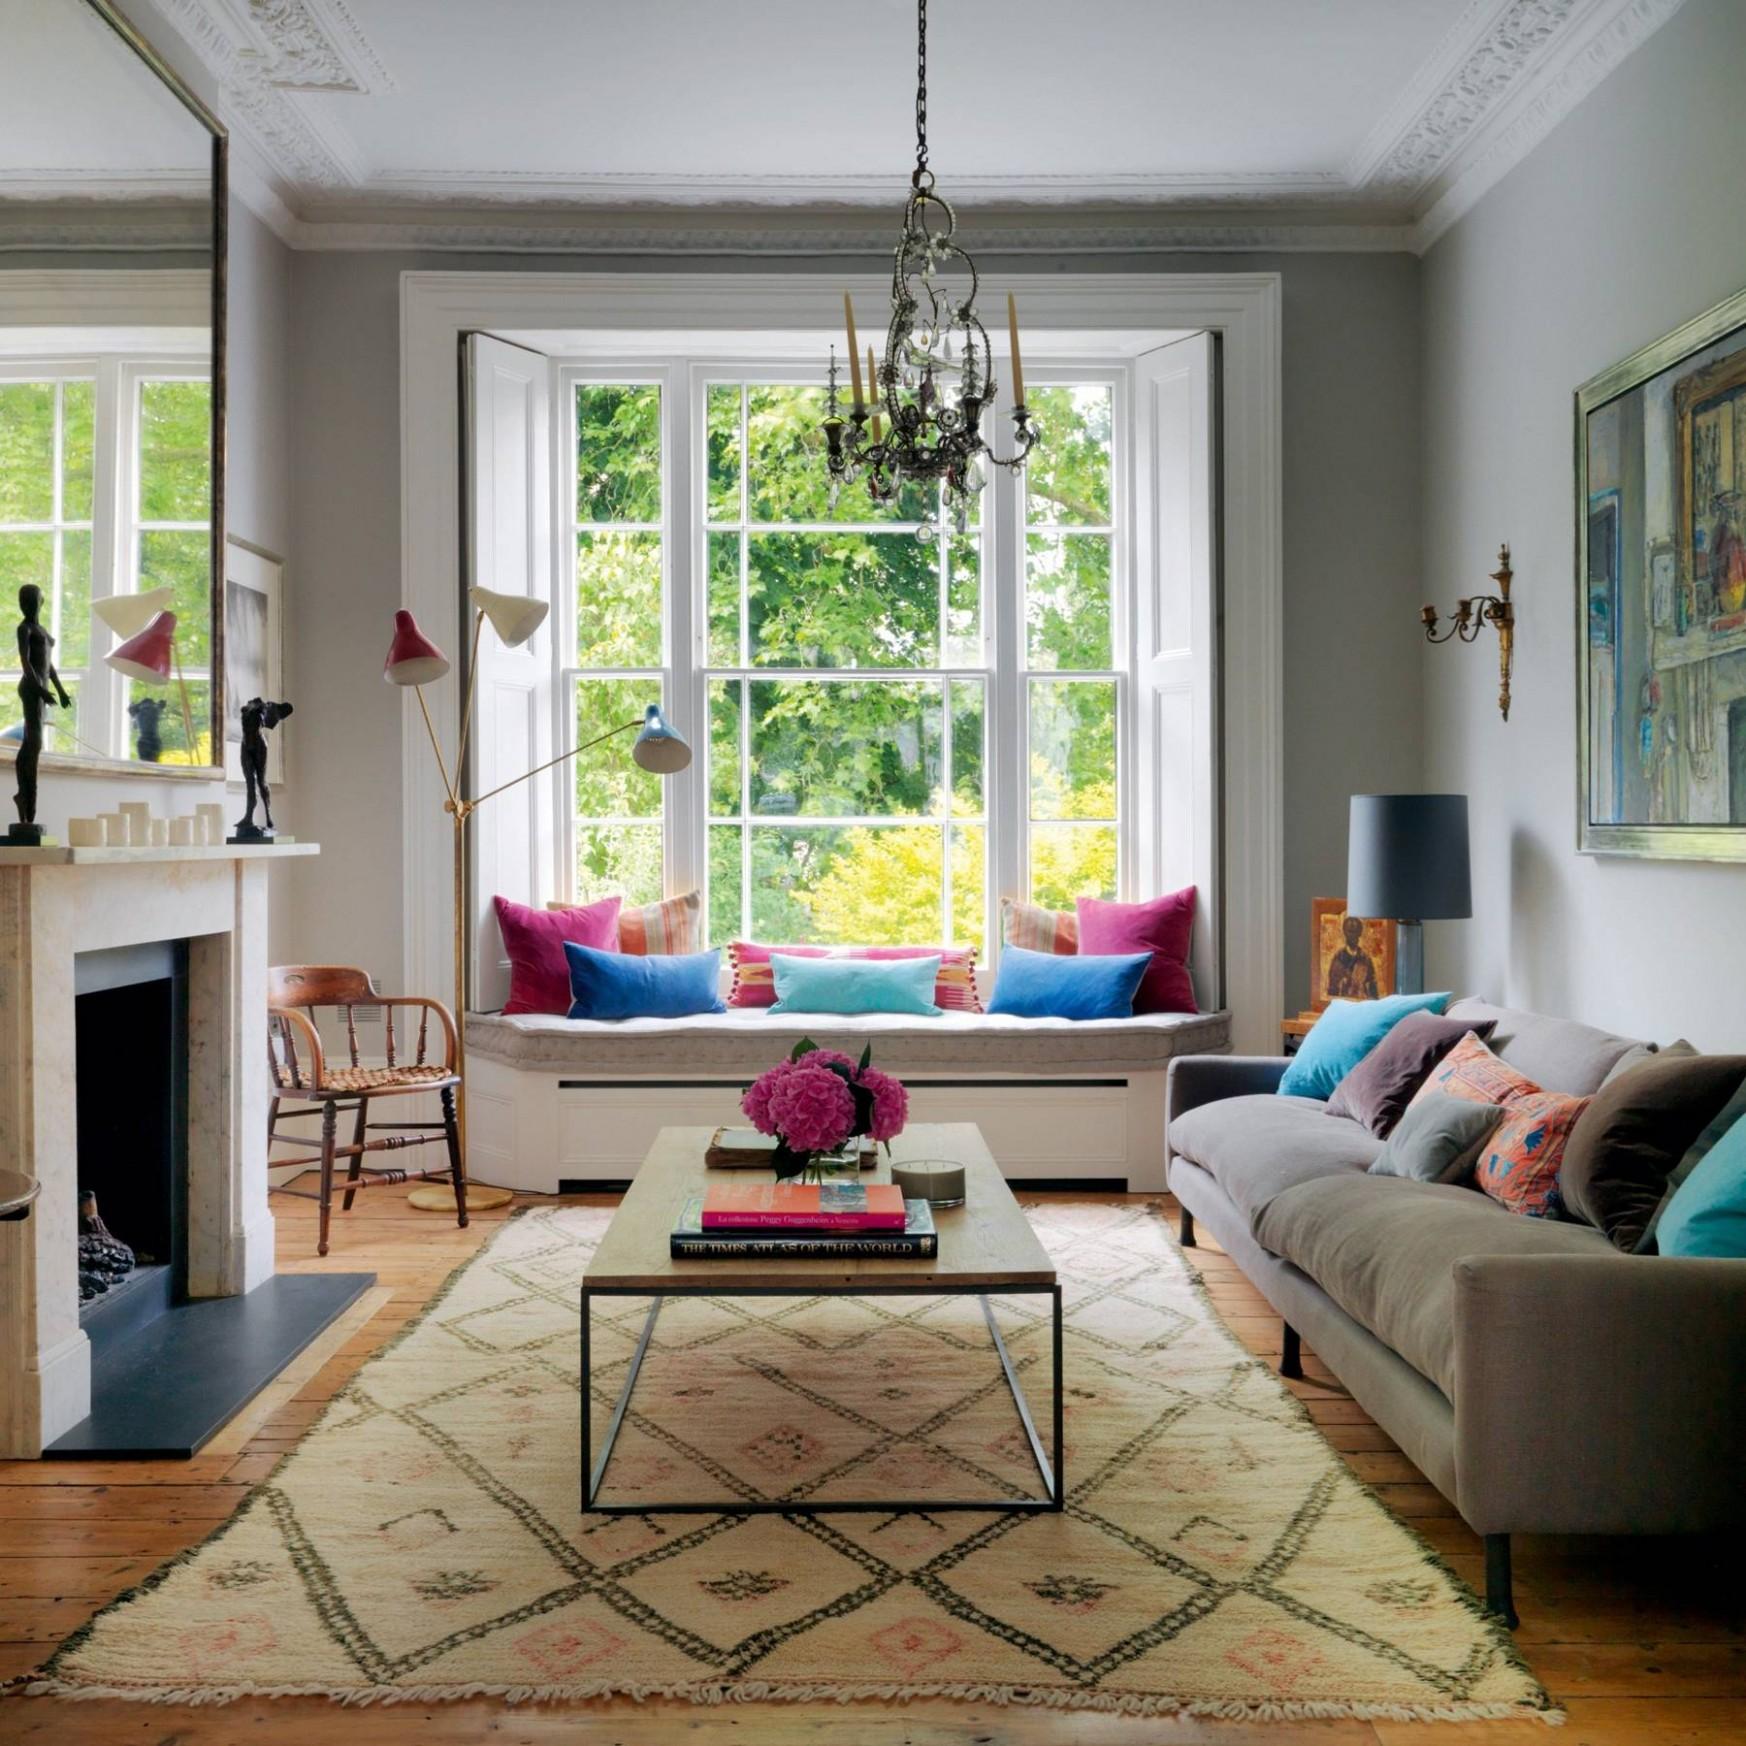 Victorian Terrace Living Room Design Ideas  Interior Design Ideas  - Dining Room Ideas Victorian